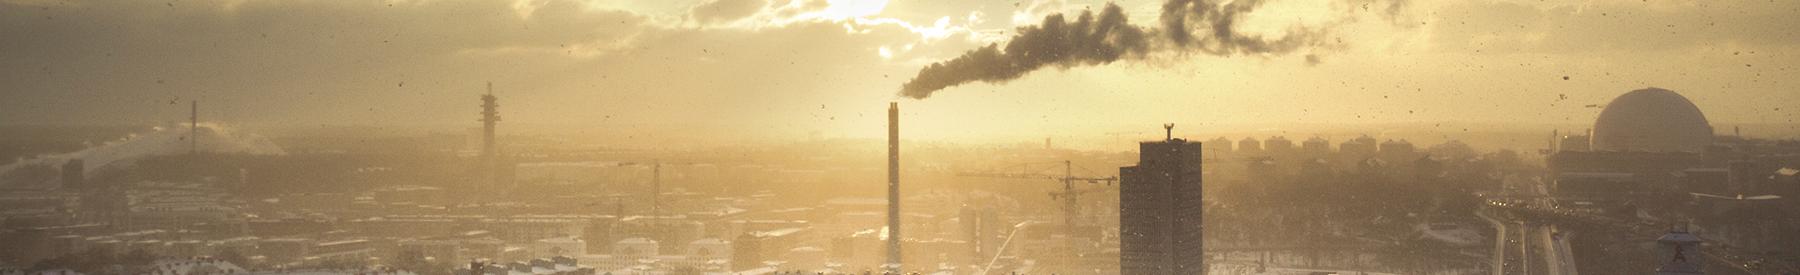 contaminacion-madrid